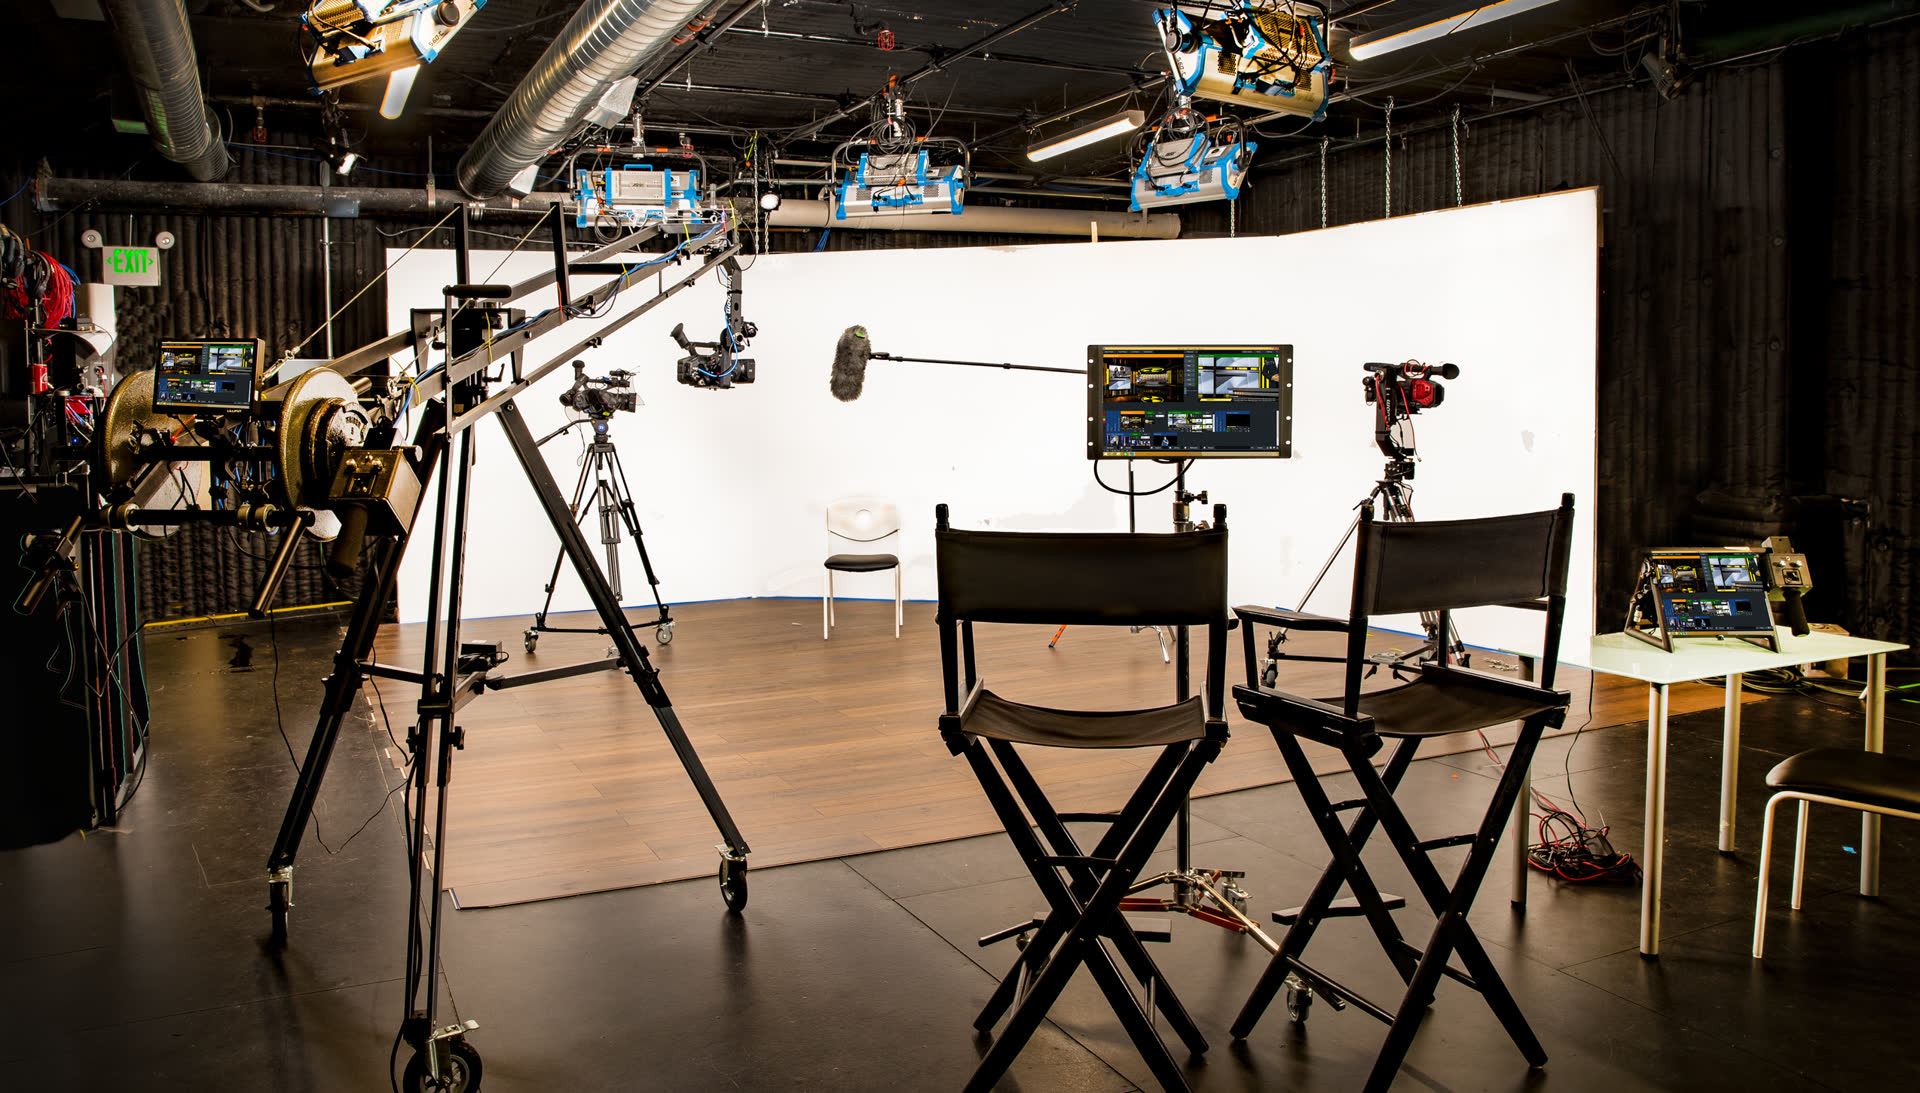 Video Studio spaces